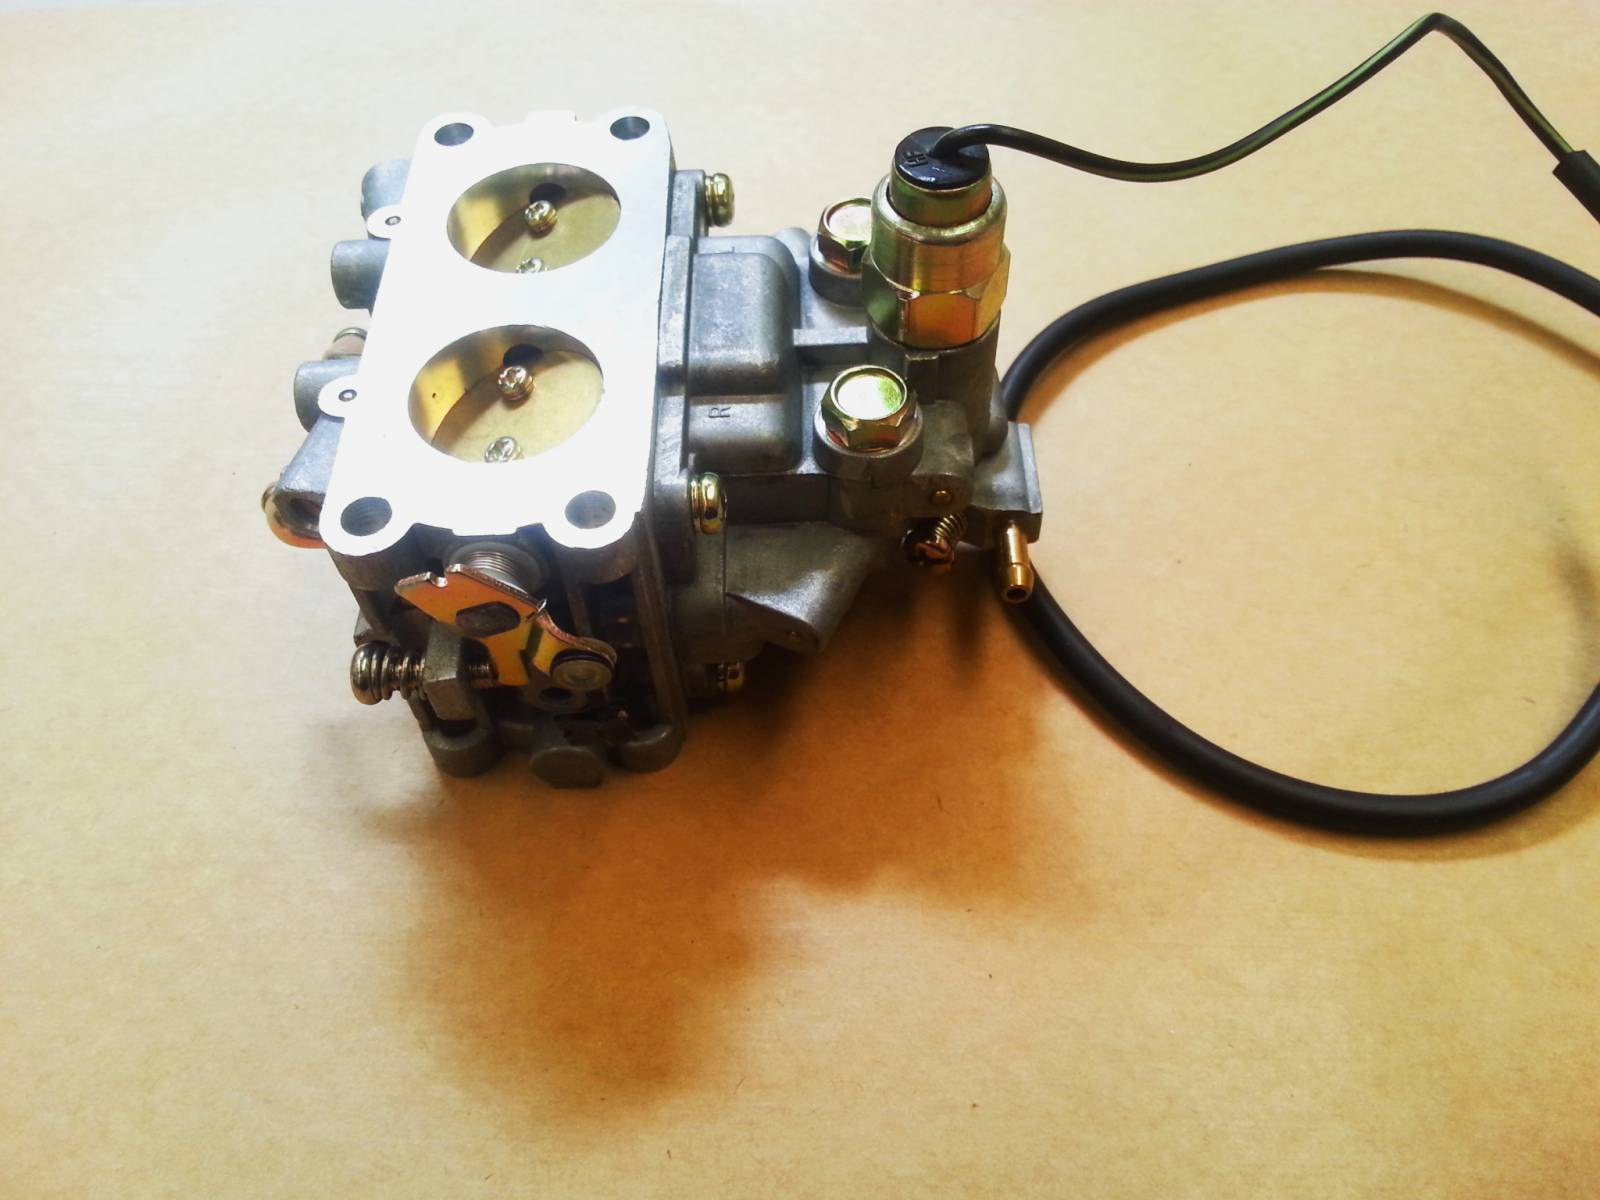 Carburador Completo - TG12000CXE/3 - Hs Floresta e Jardim